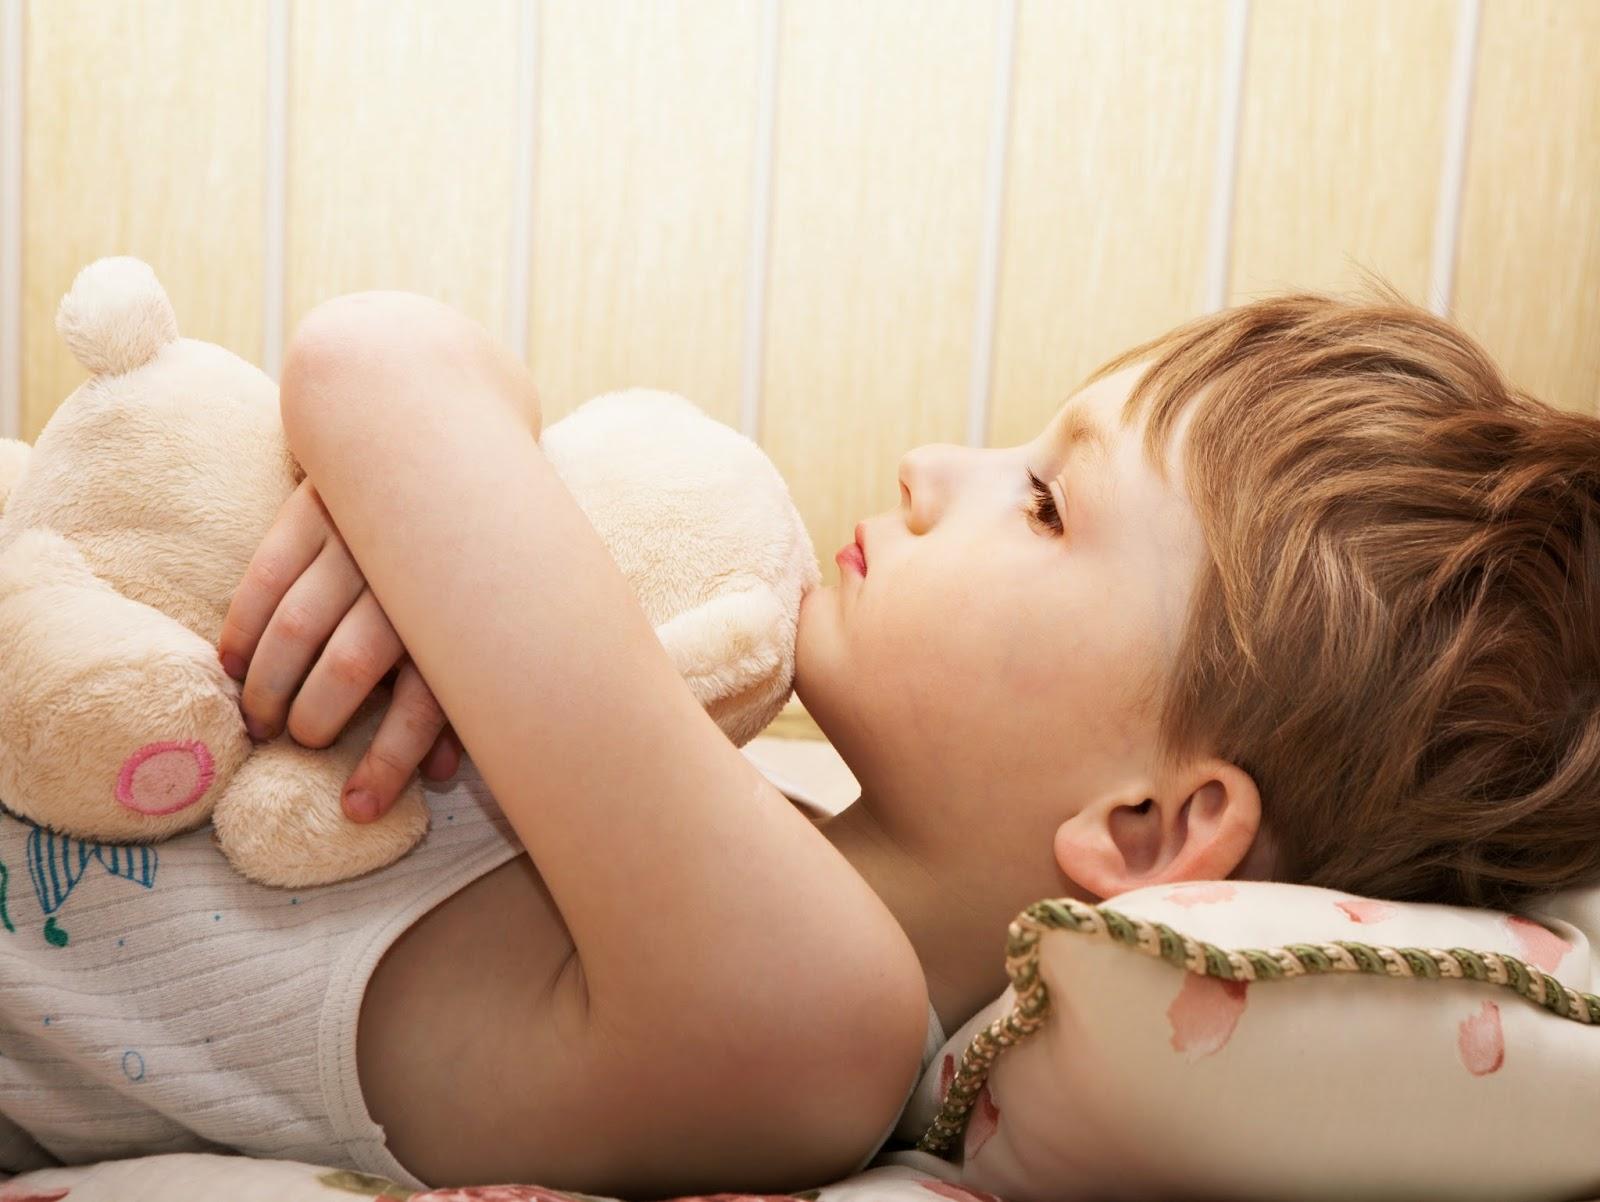 anak sukar tidur